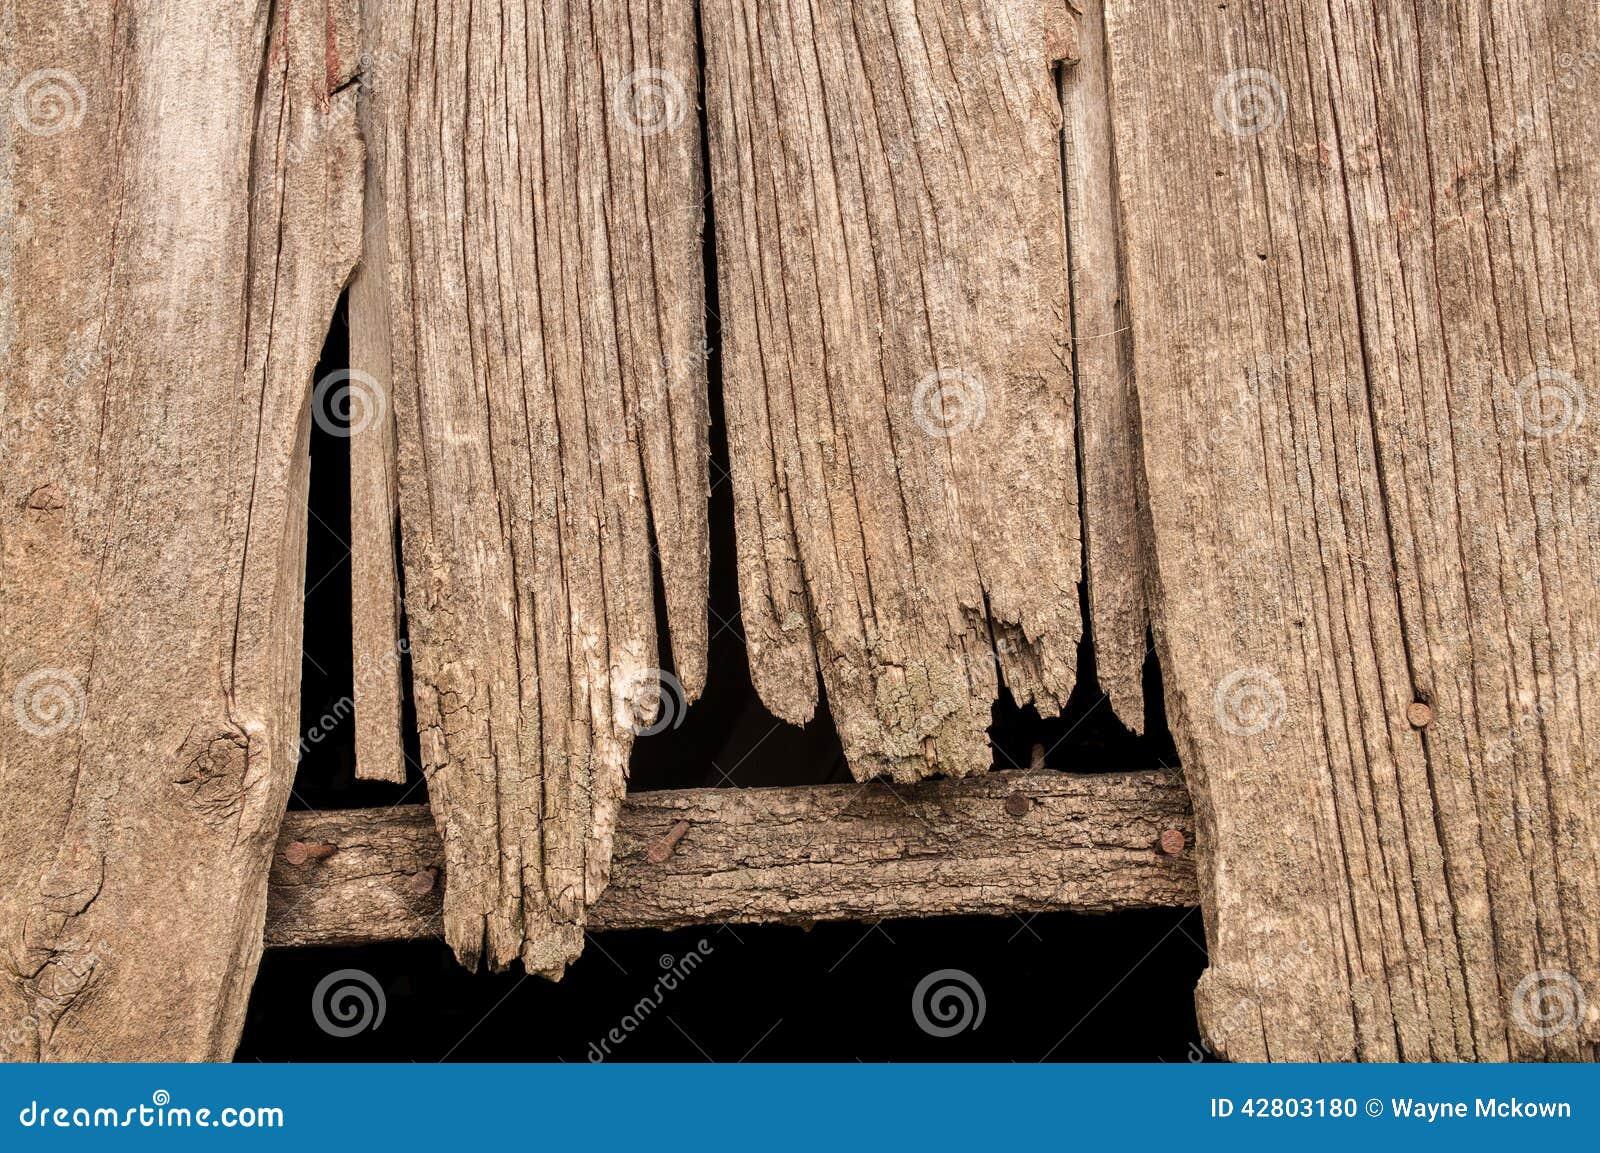 Weathered Barn Wood : Old Weathered Barn Wood